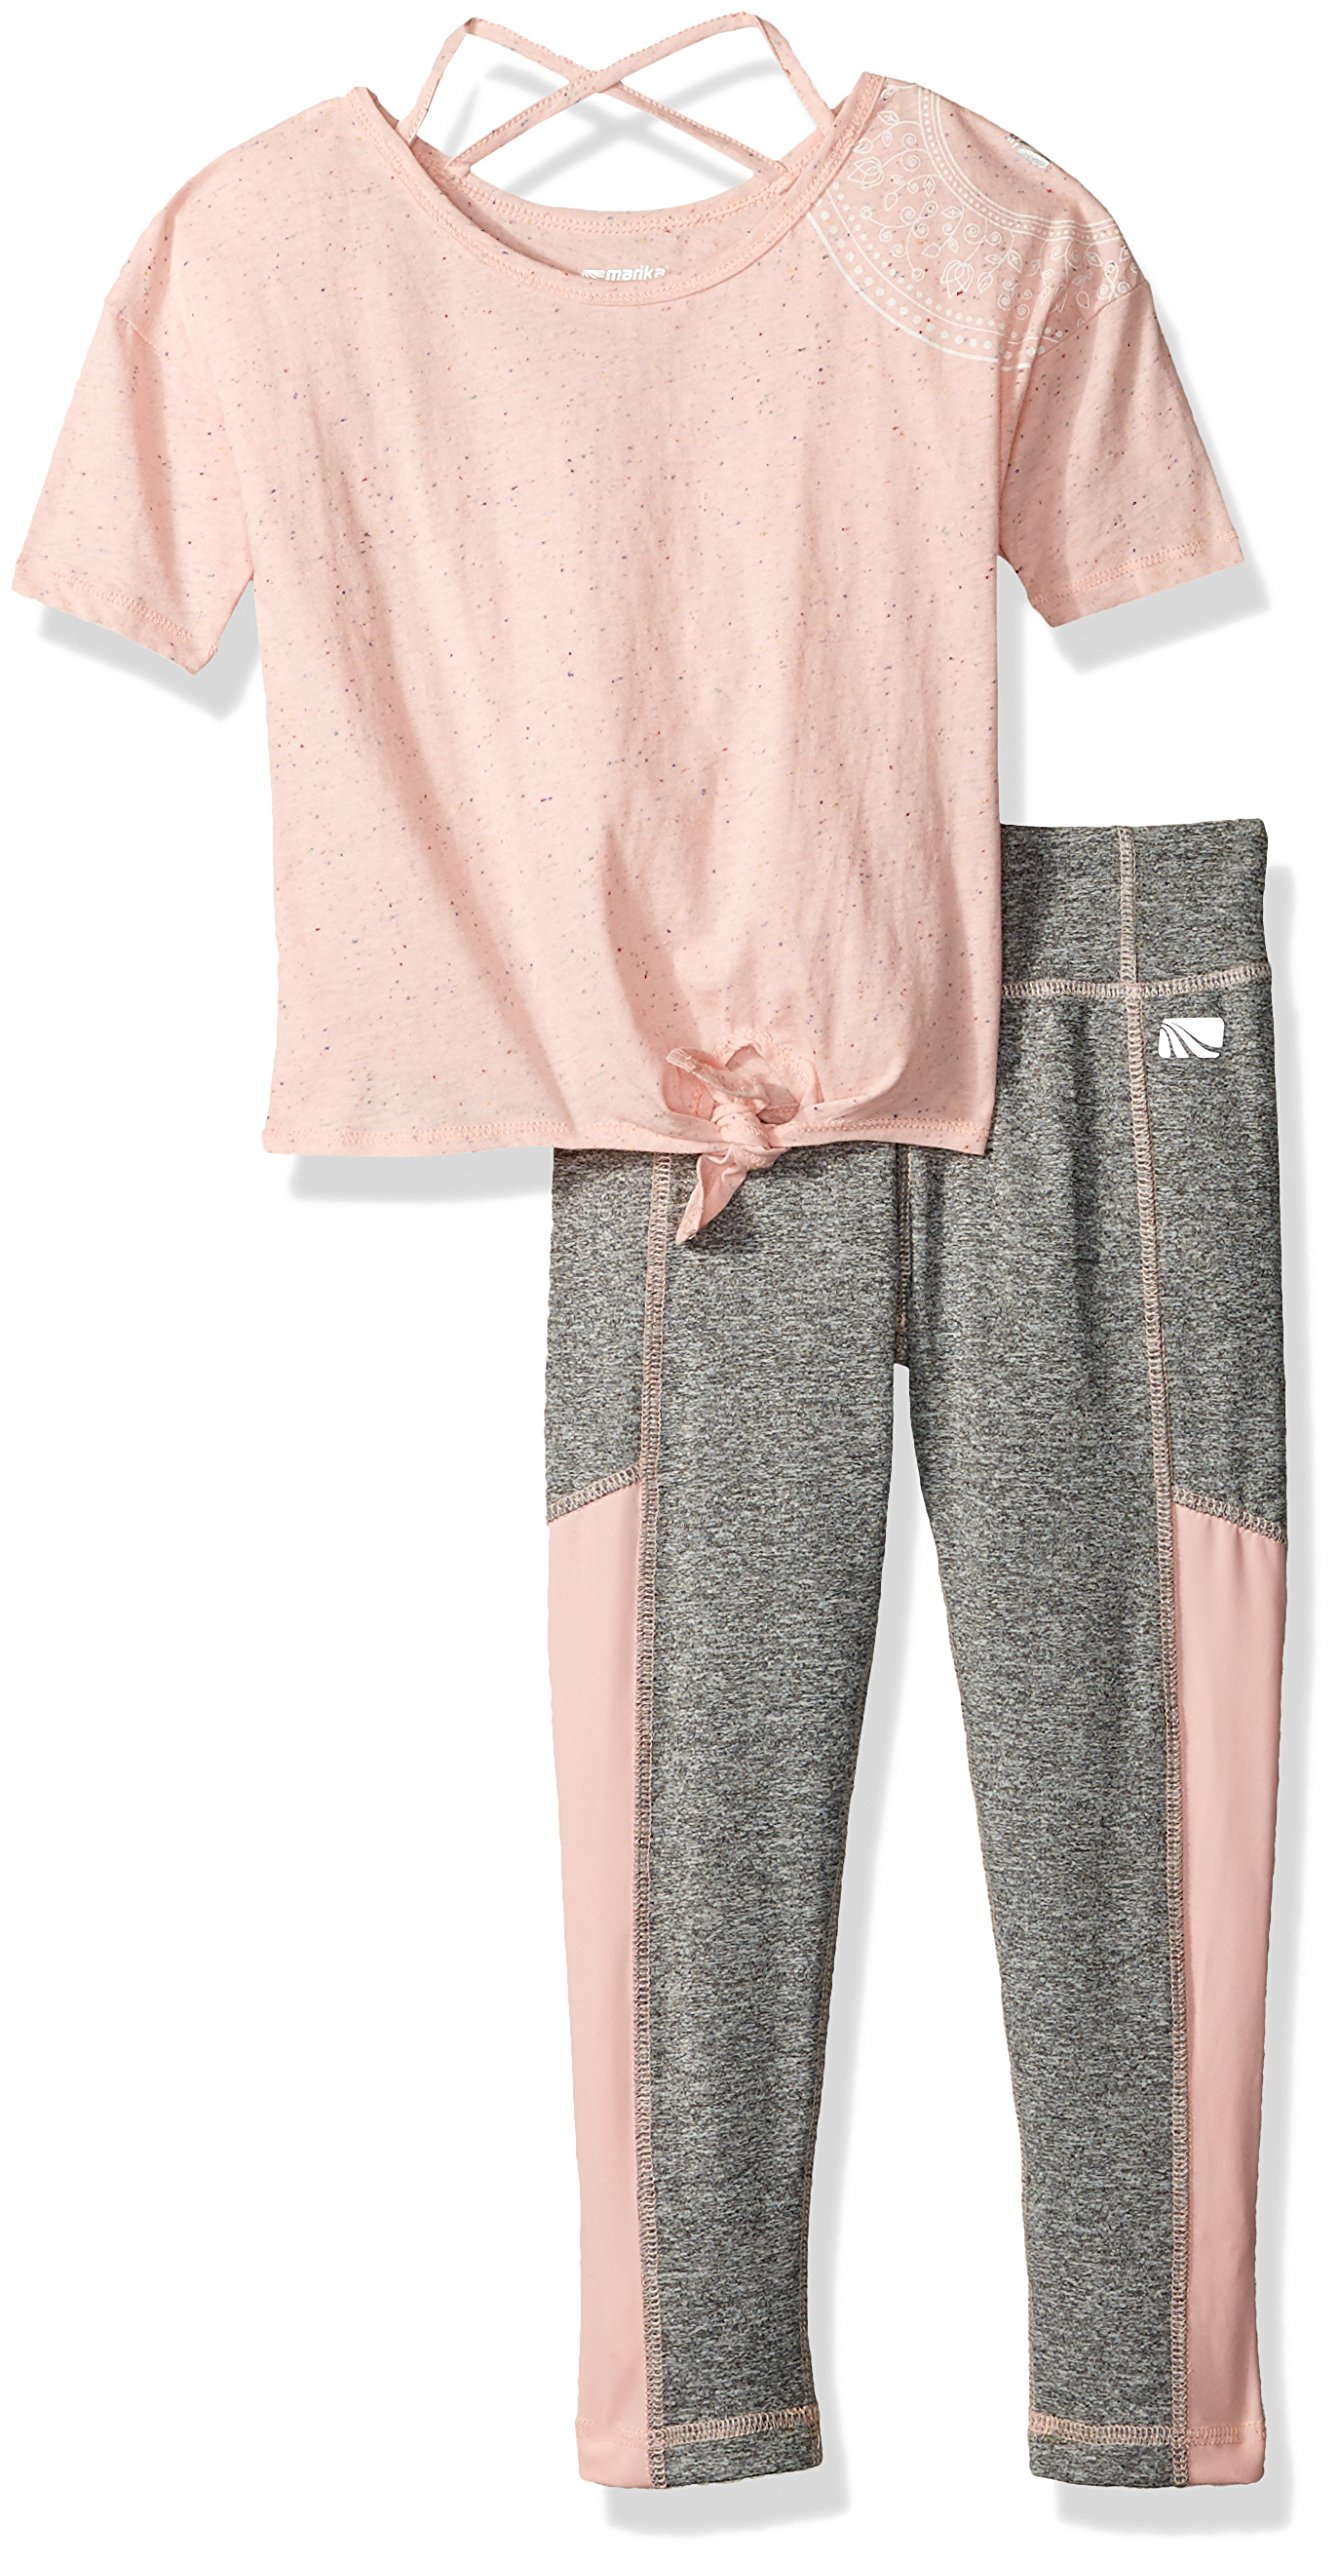 Marika Girls' Little 2 Piece Knit Top and Legging Set, blush-694, 5/6